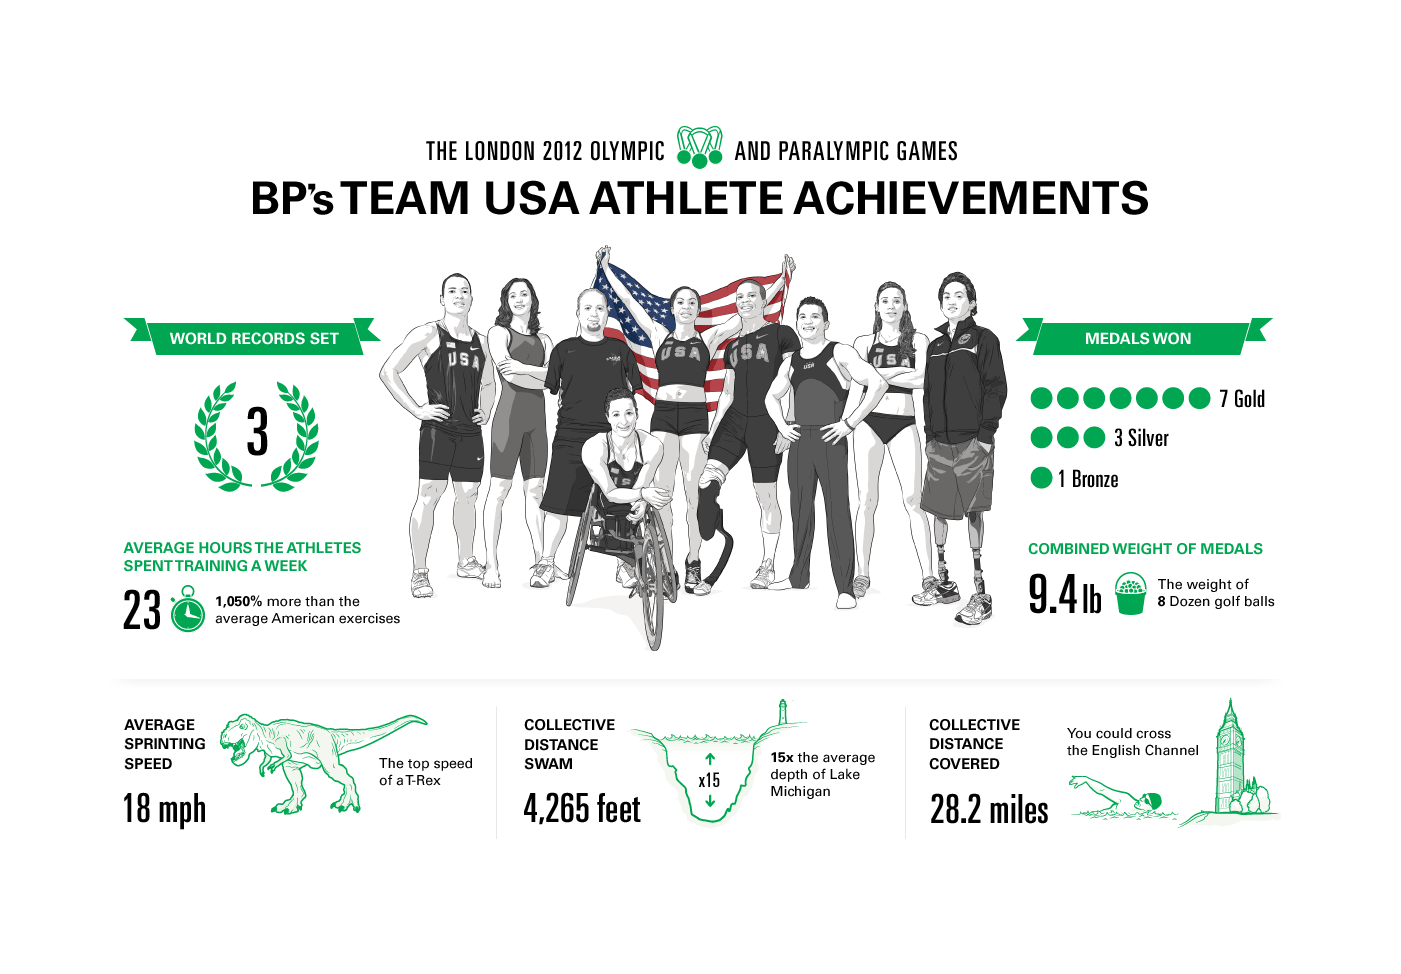 BP's Team USA Athlete Achievements Infographic by Max Hancock